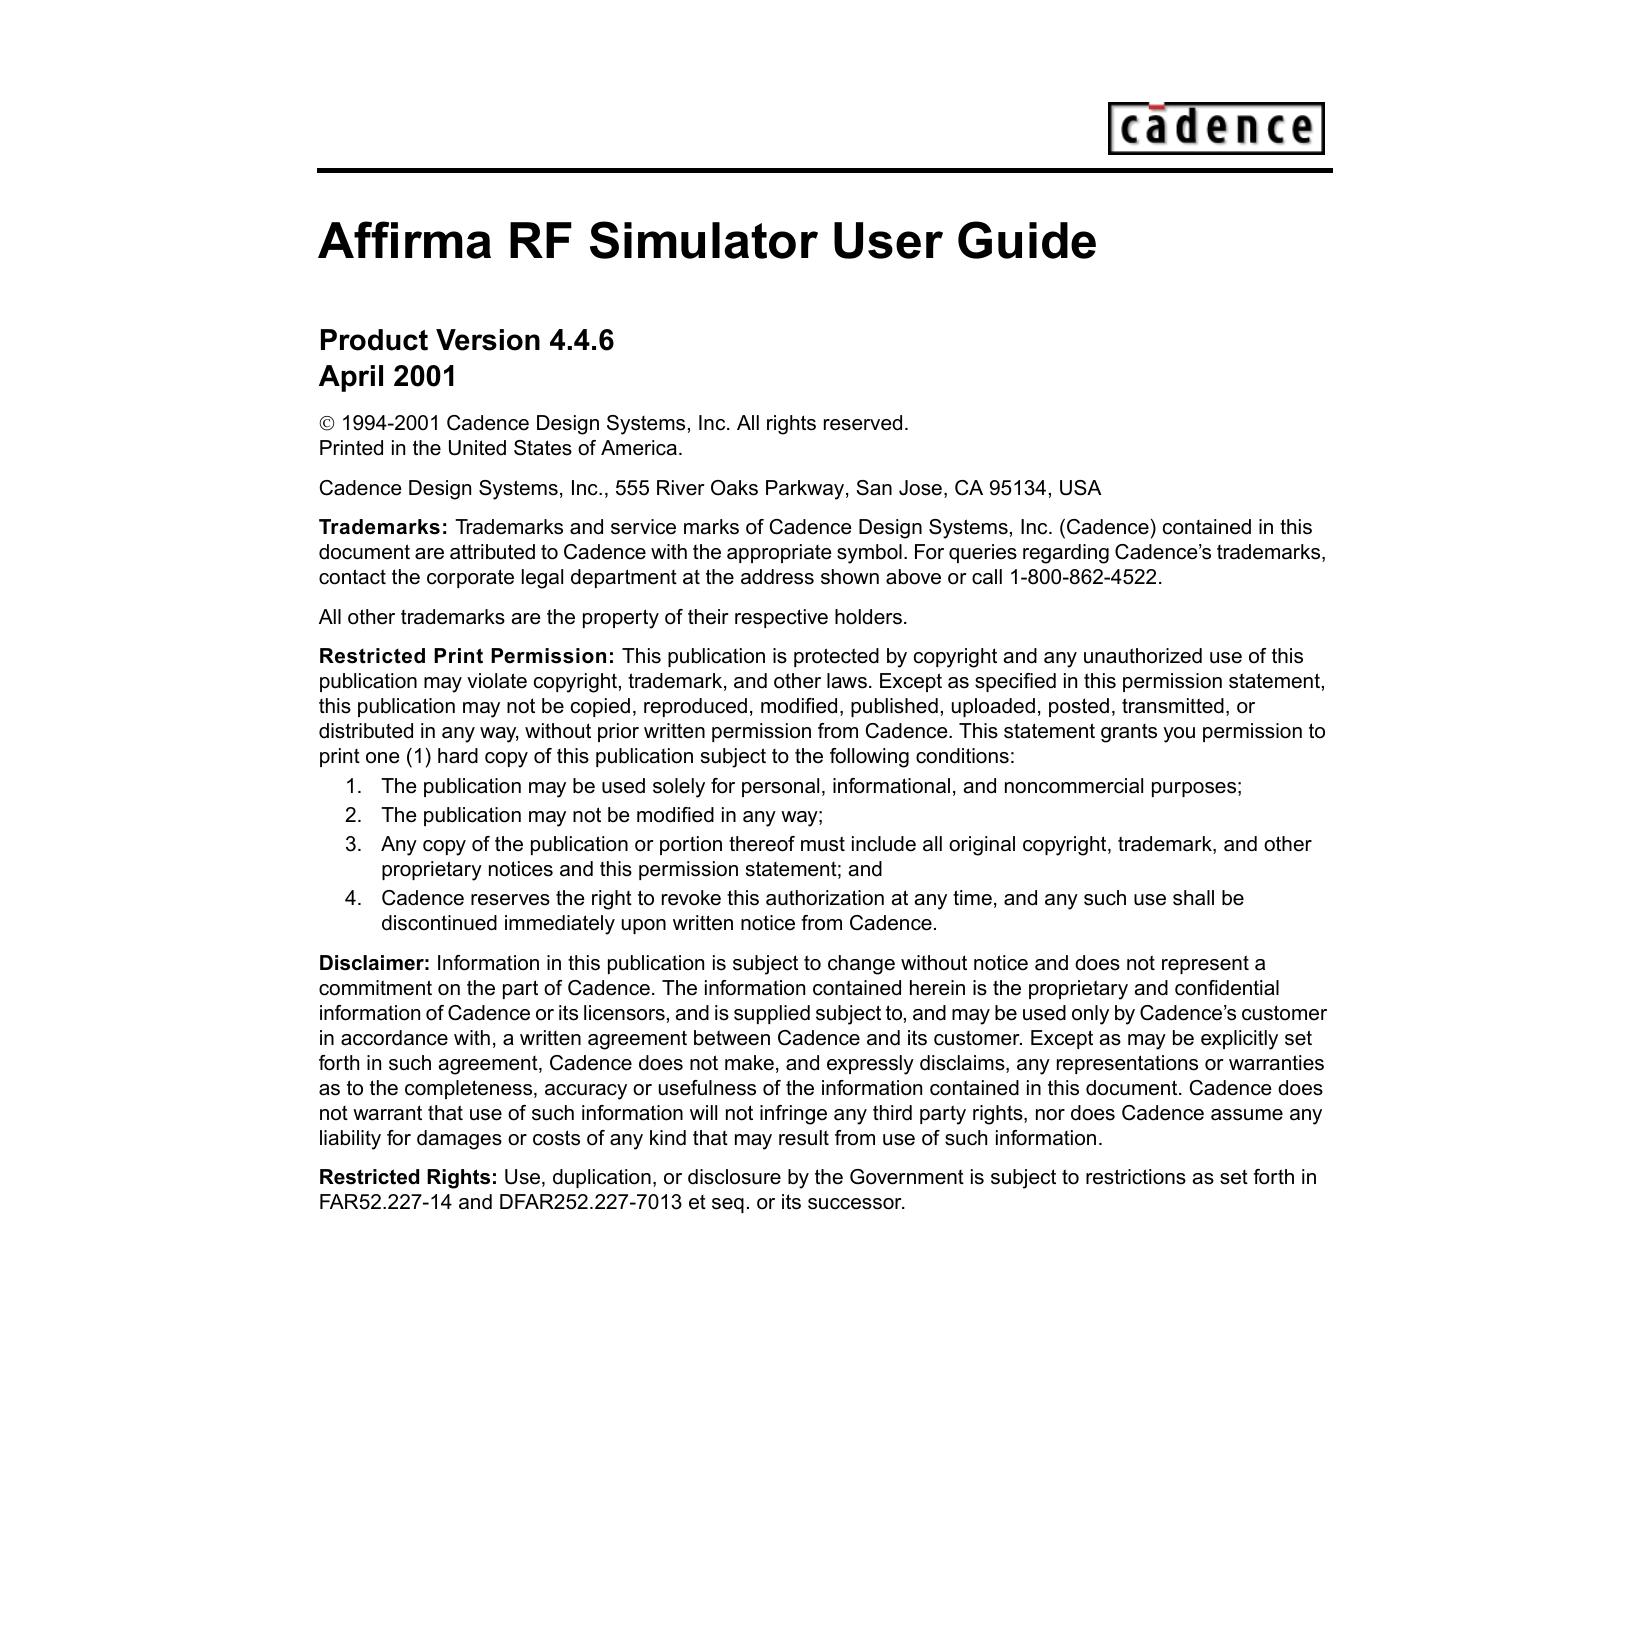 affirma rf simulator spectrerf user guide